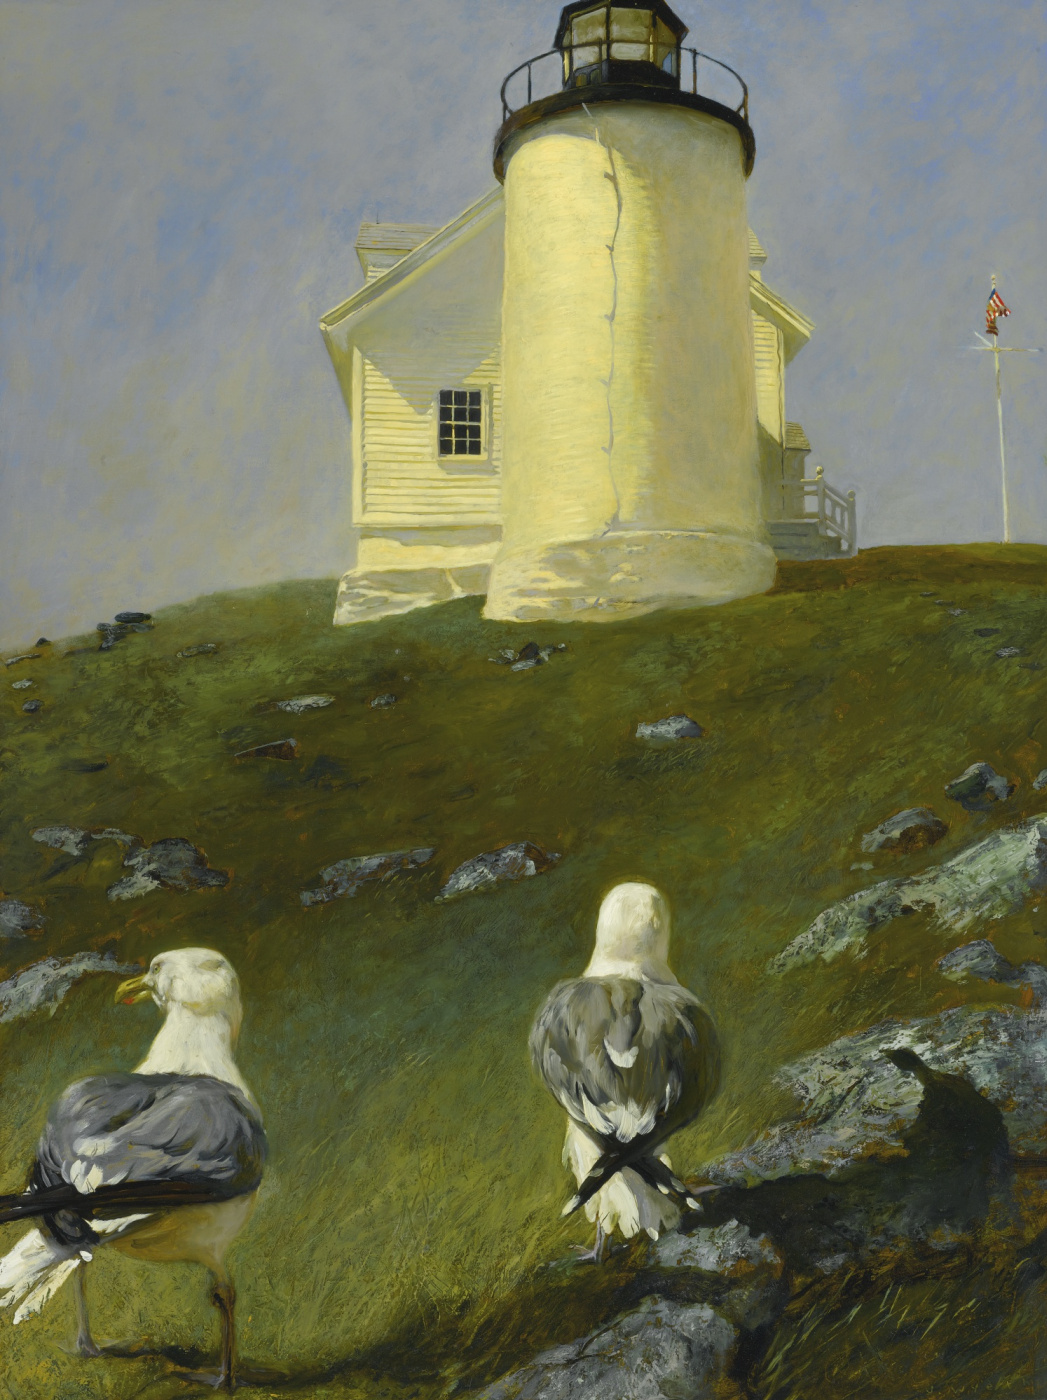 Jamie Wyeth. Seagulls